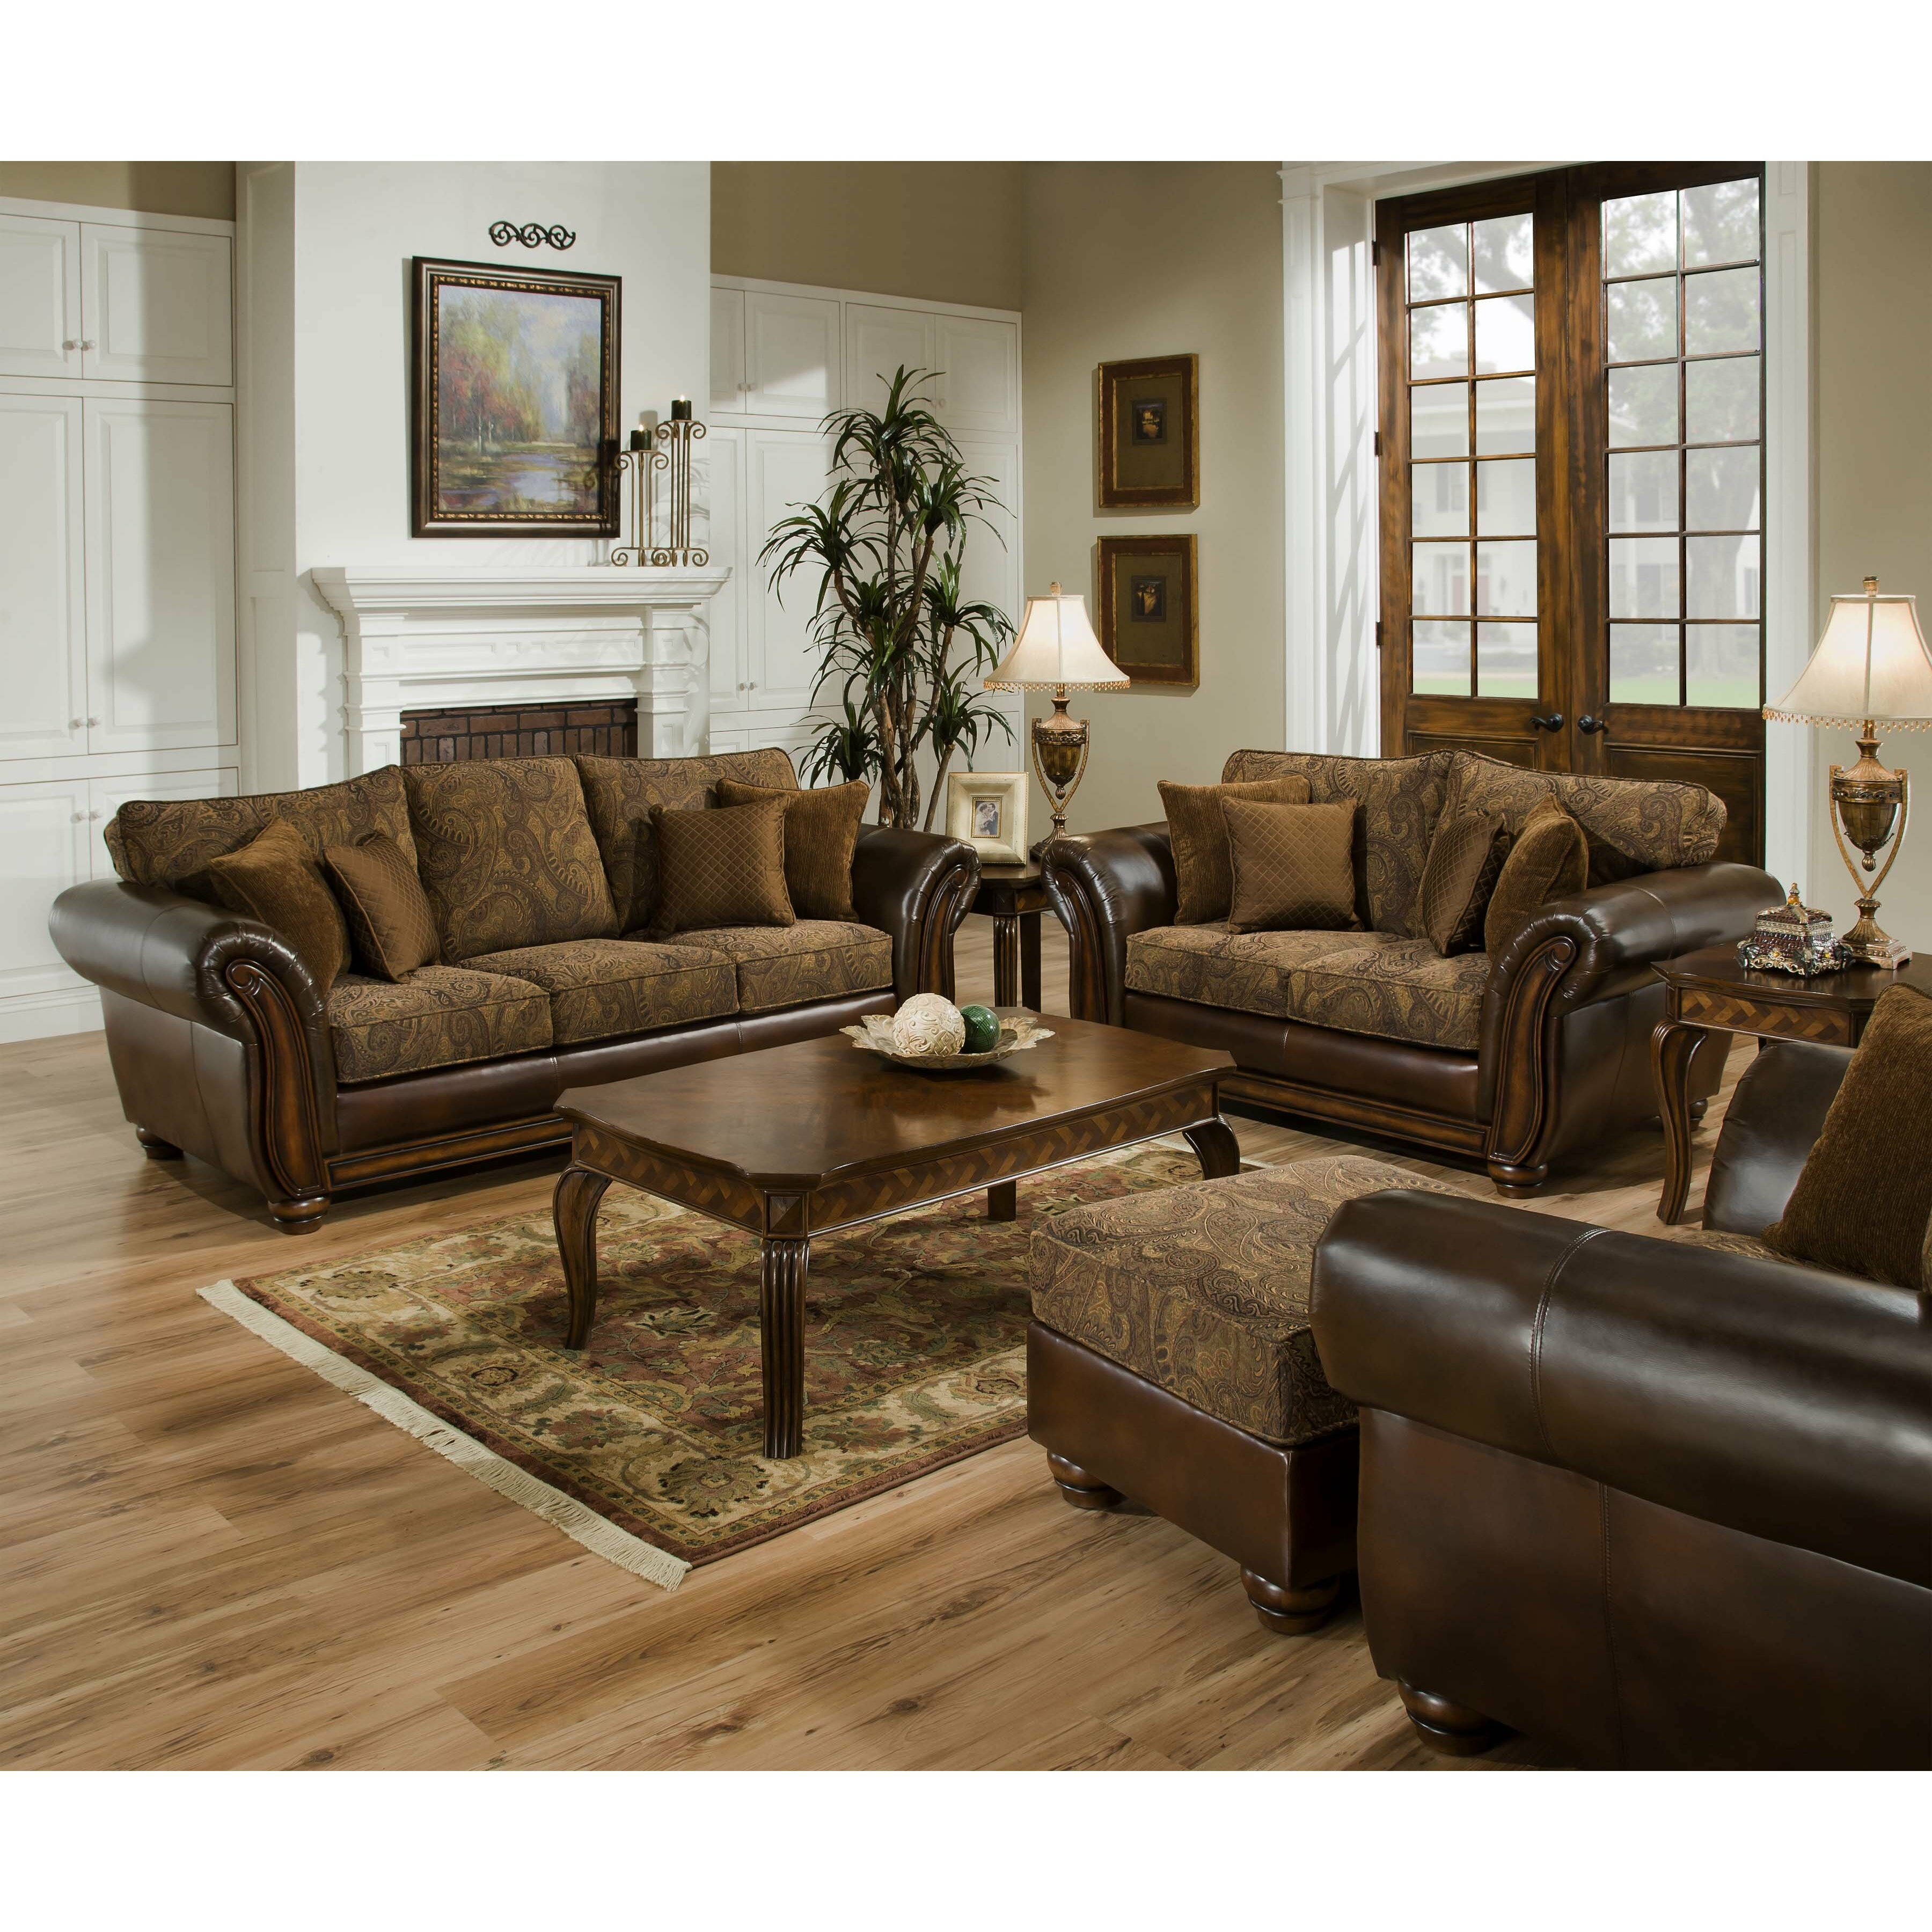 Living Room Club Chairs Astoria Grand Simmons Upholstery Aske Club Chair Reviews Wayfair